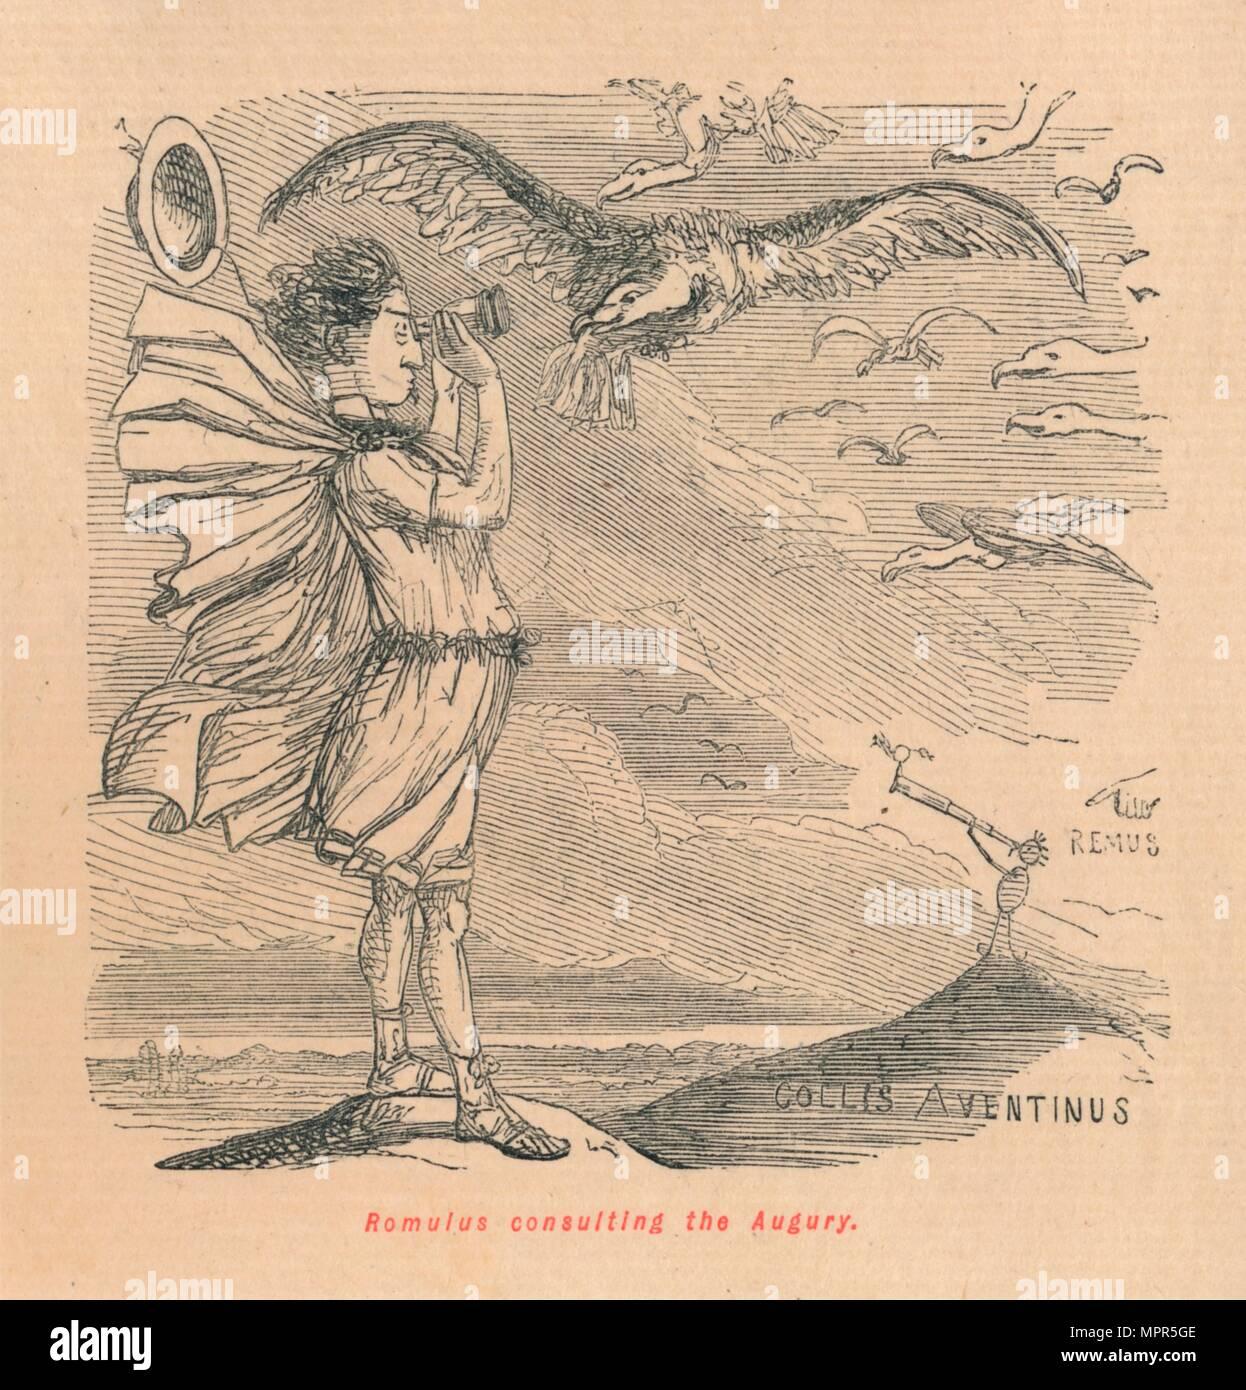 'Romulus consulting the Augury', 1852. Artist: John Leech. - Stock Image